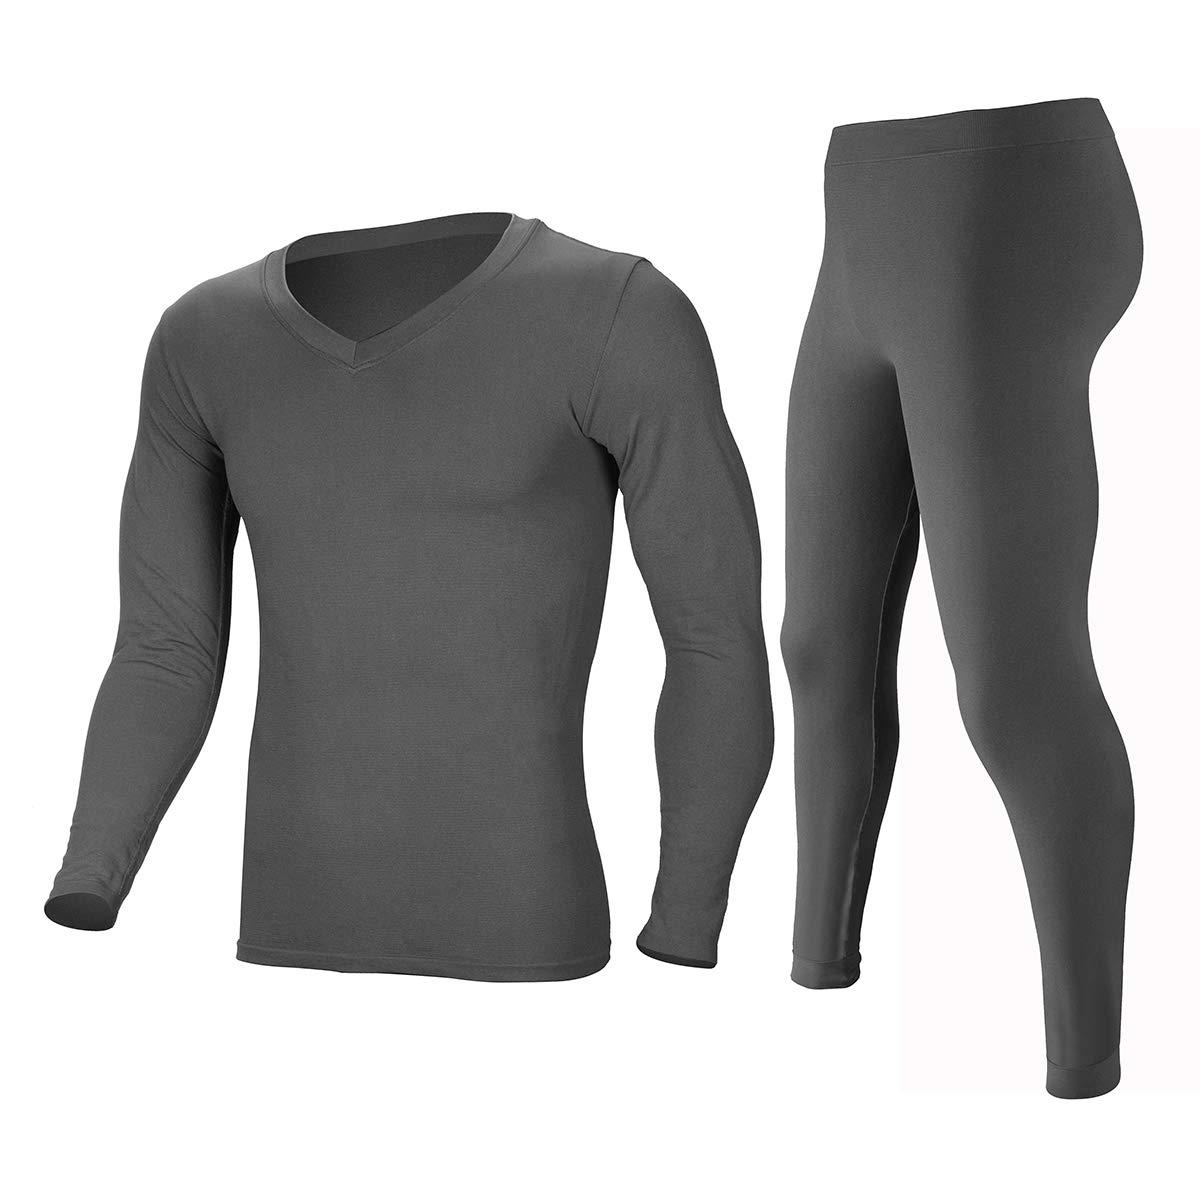 Men's Light Weight Thermal Underwear Ultra Soft Baselayer Long Johns Set Winter Warm Top & Bottom GL Grey by Innvix